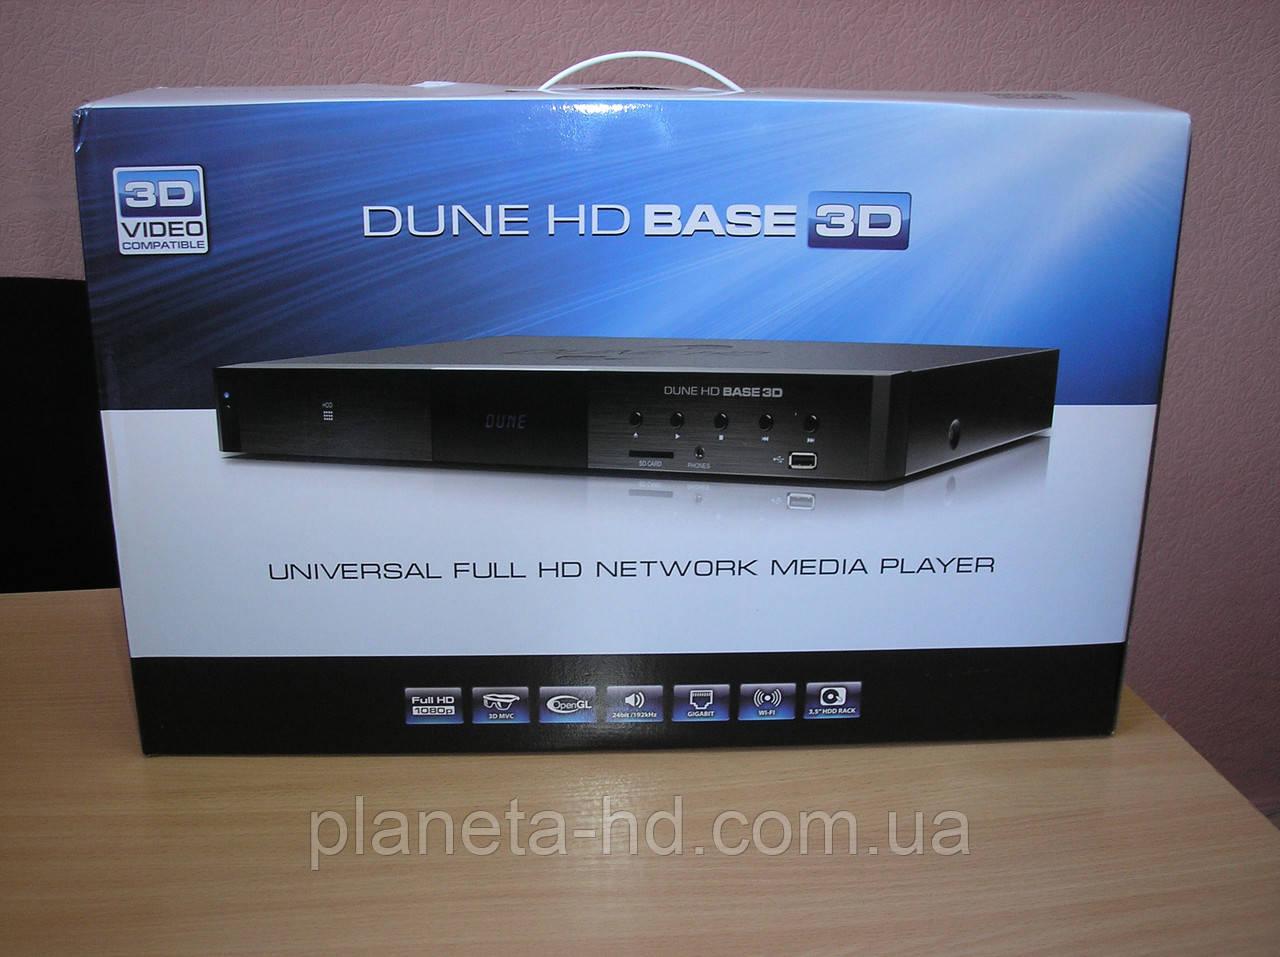 Dune HD Base3D Media Player Drivers Mac